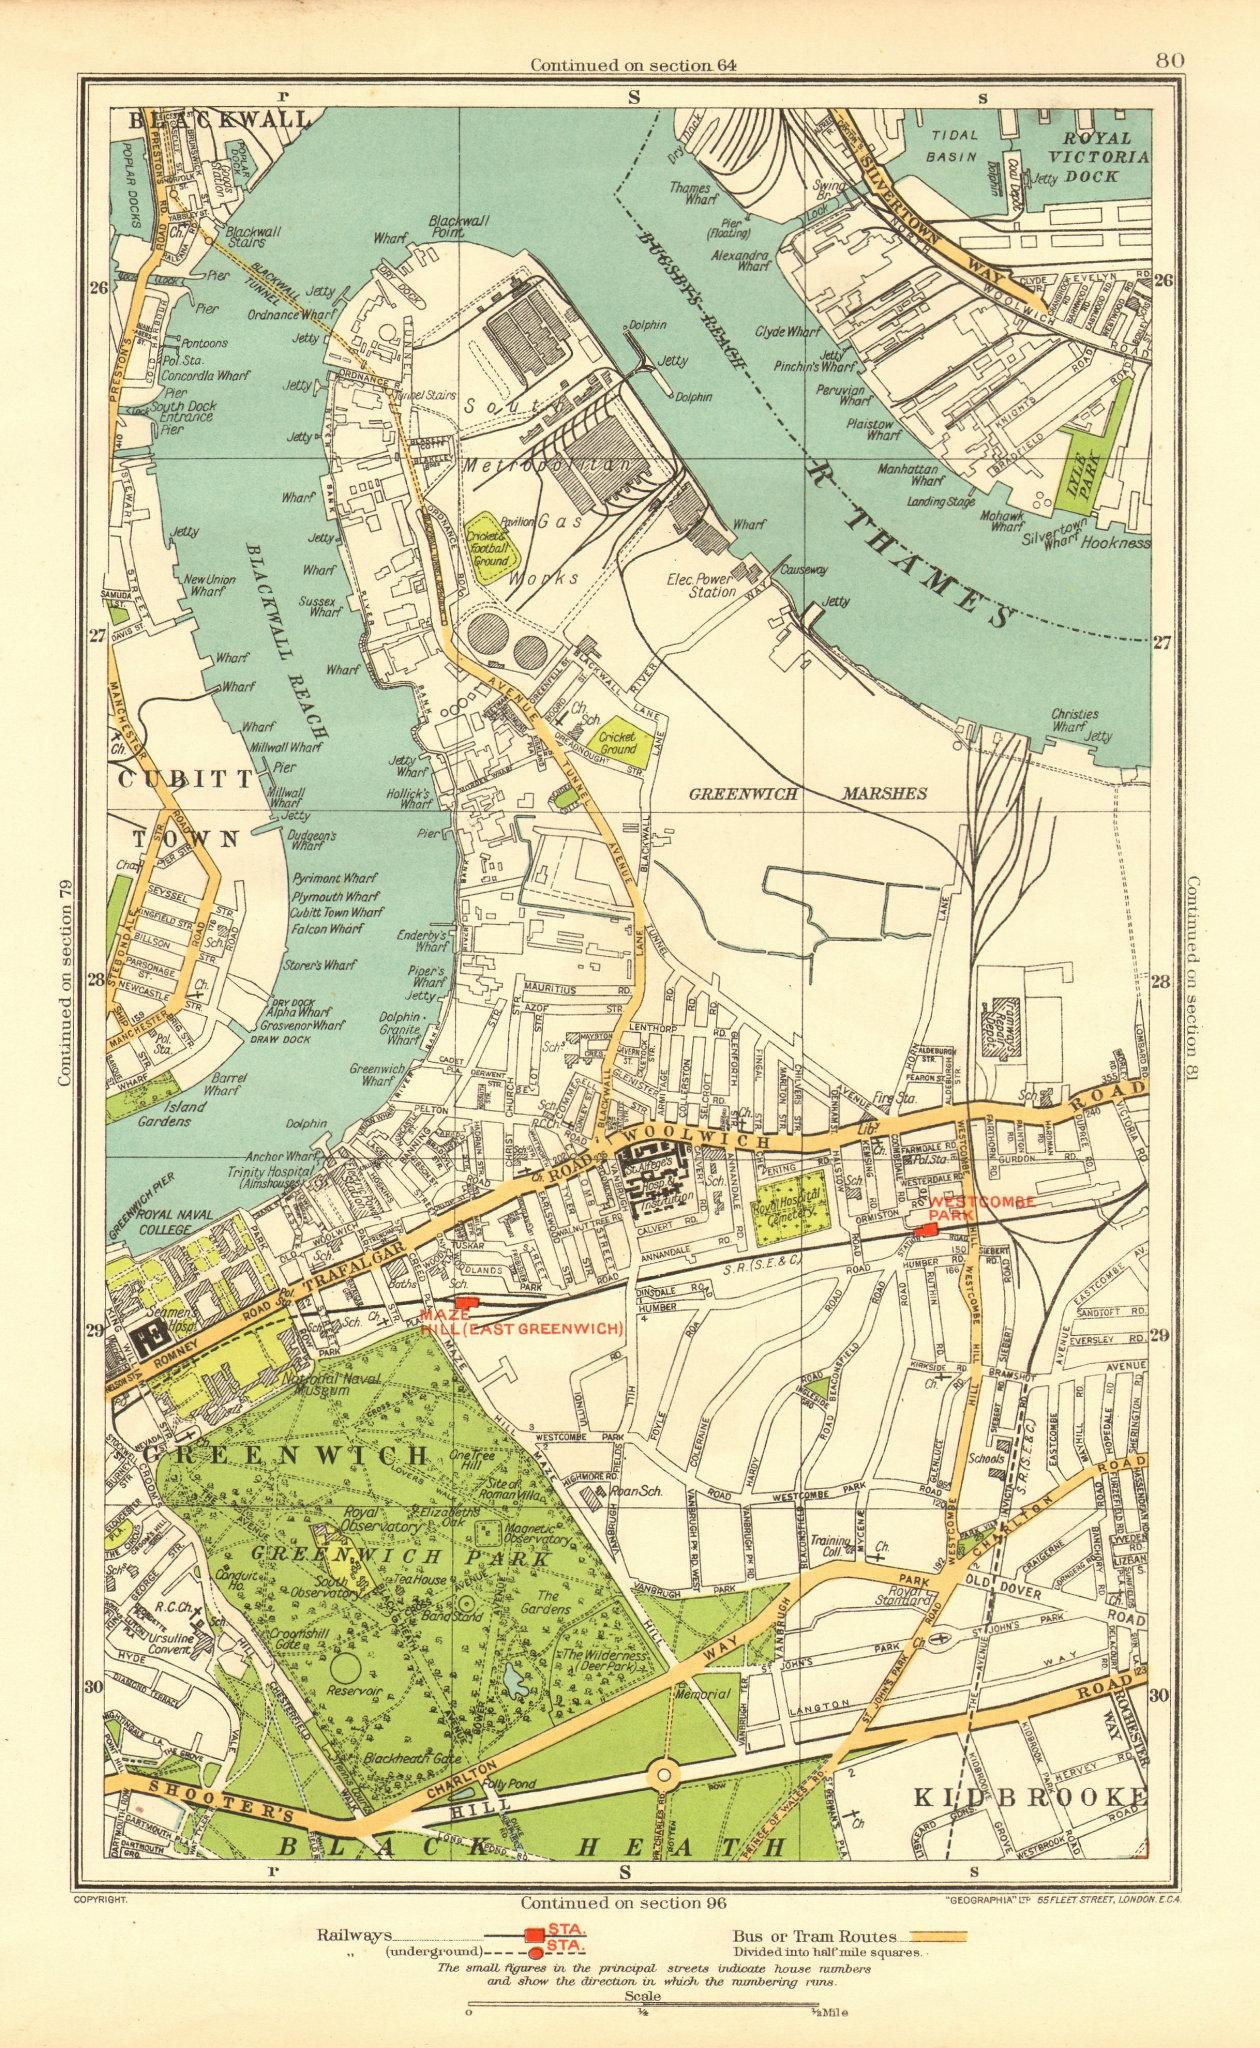 Associate Product GREENWICH. Blackwall Cubitt Town Silvertown Kidbrooke Maze Hill 1937 old map